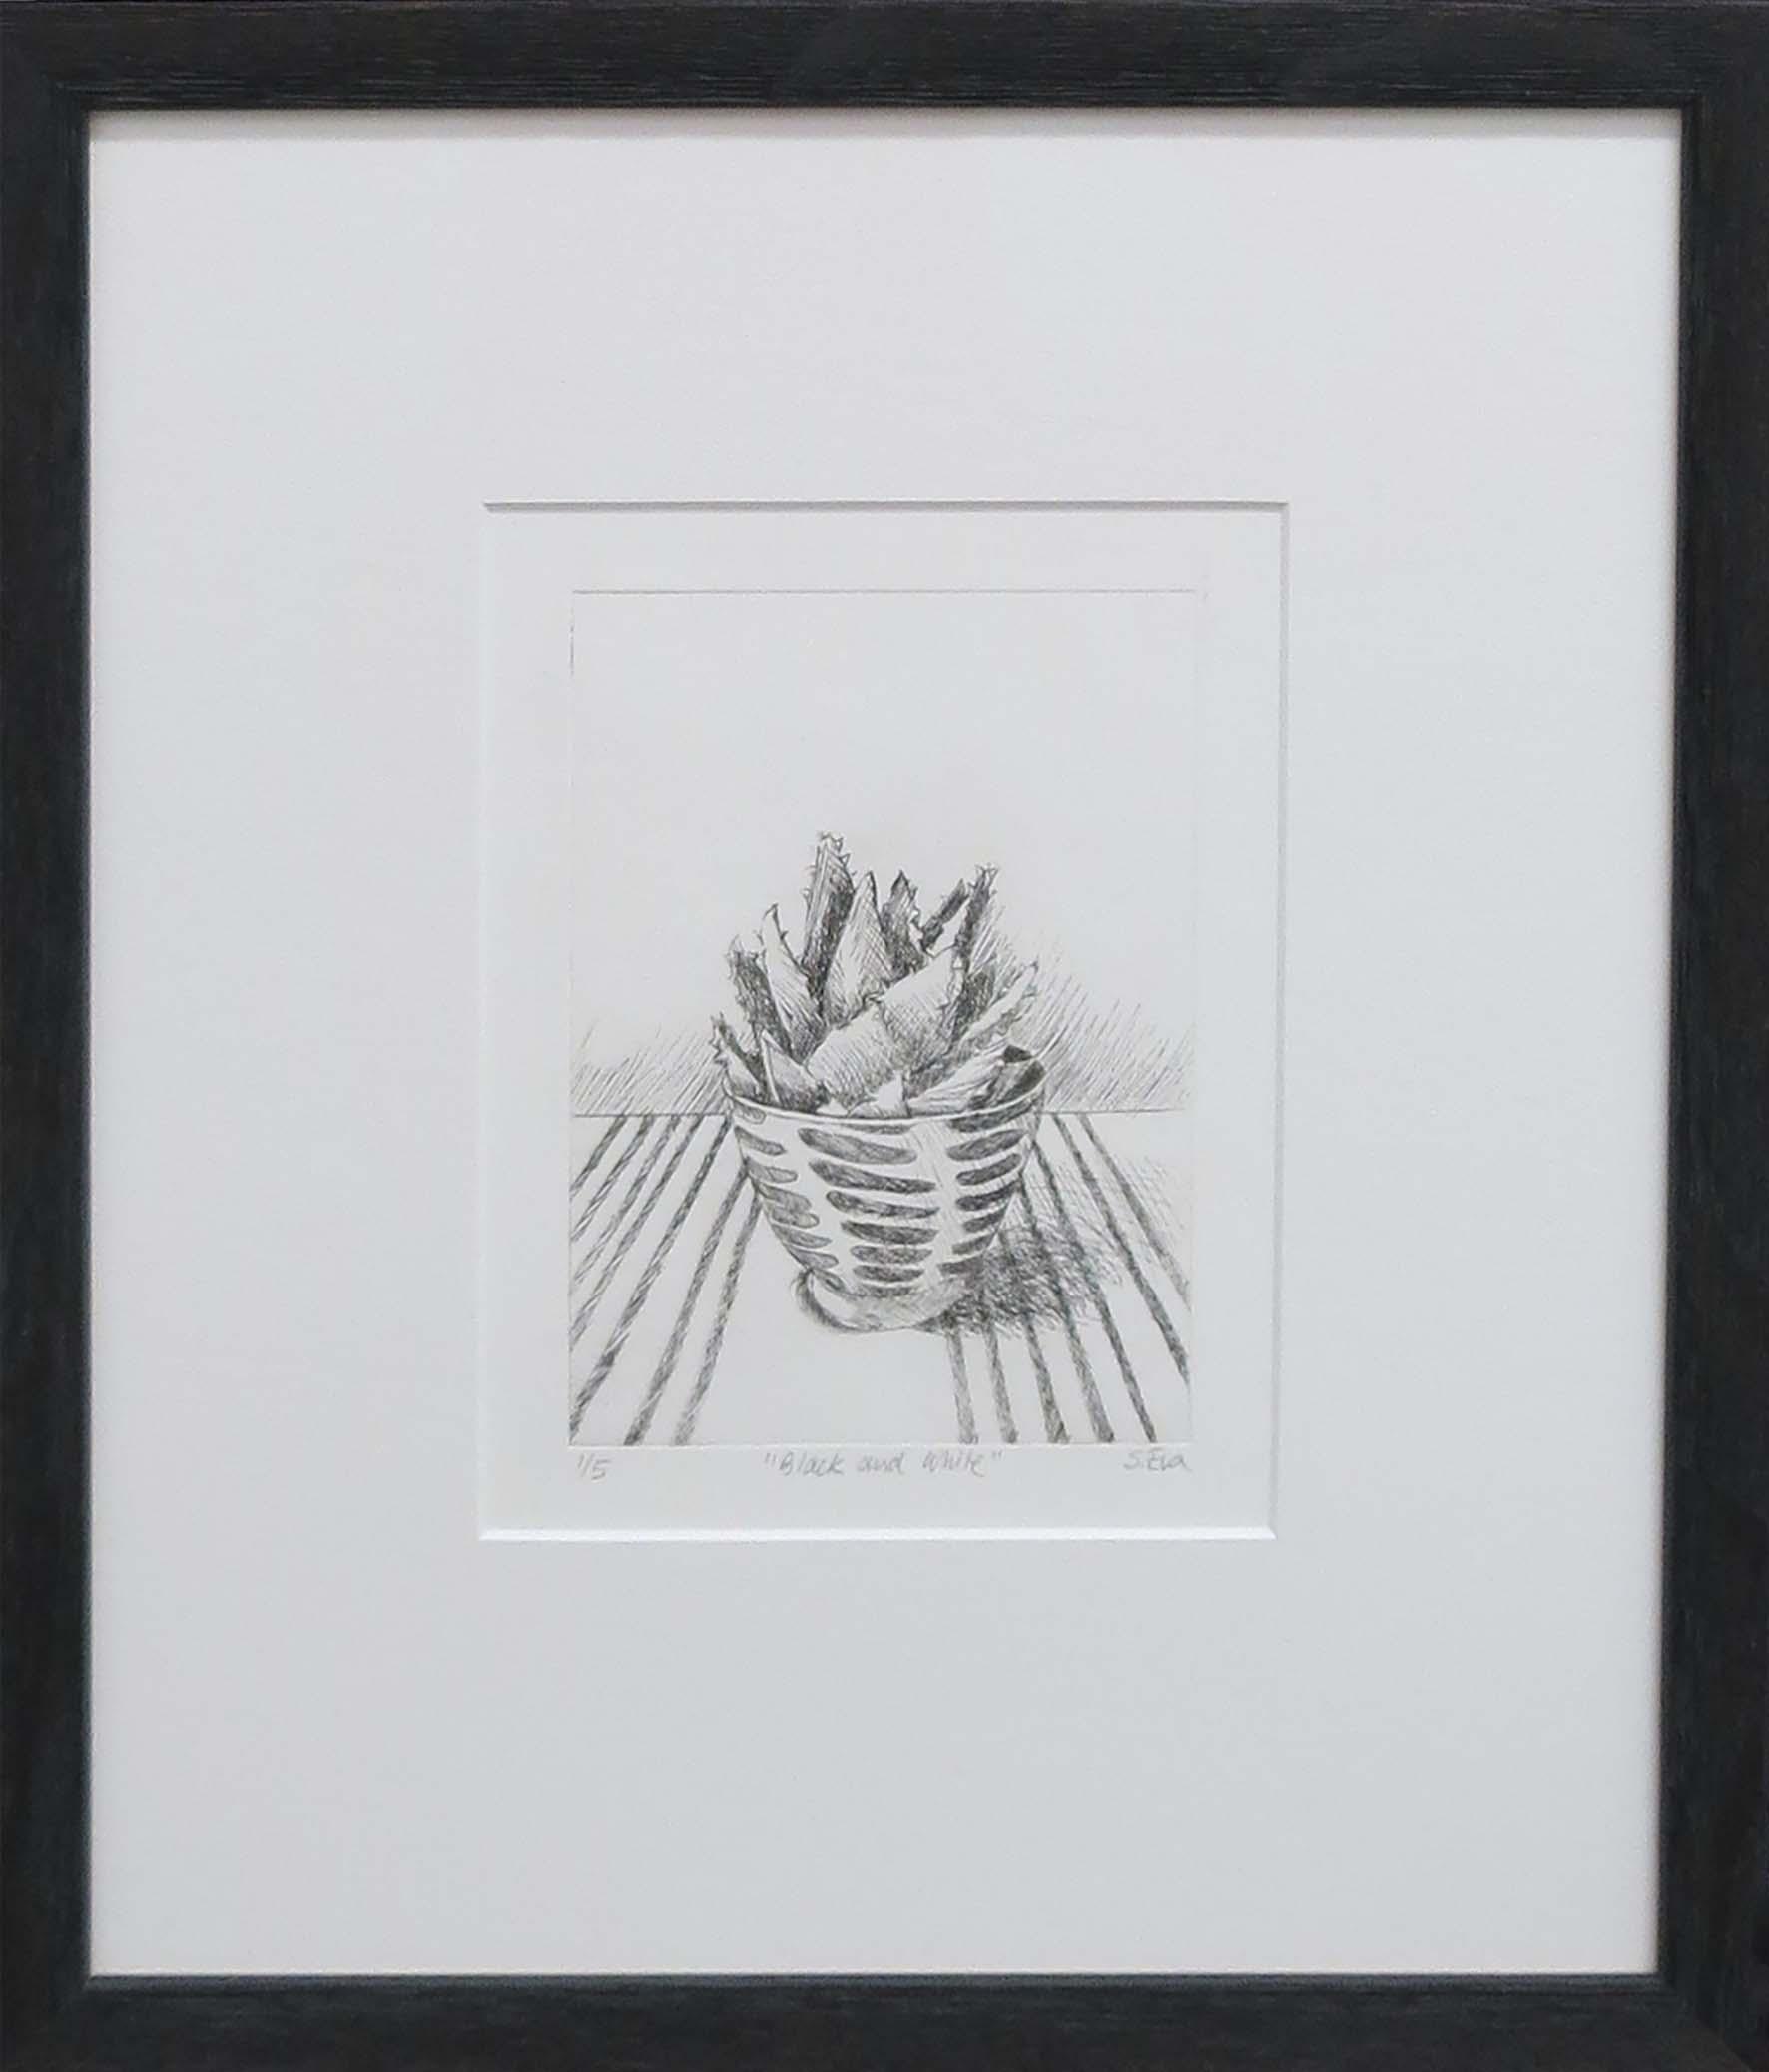 2. Sue Eva, 'Black and White', 2018, Drypoint etching, 15.5 x 11.5cm, $195